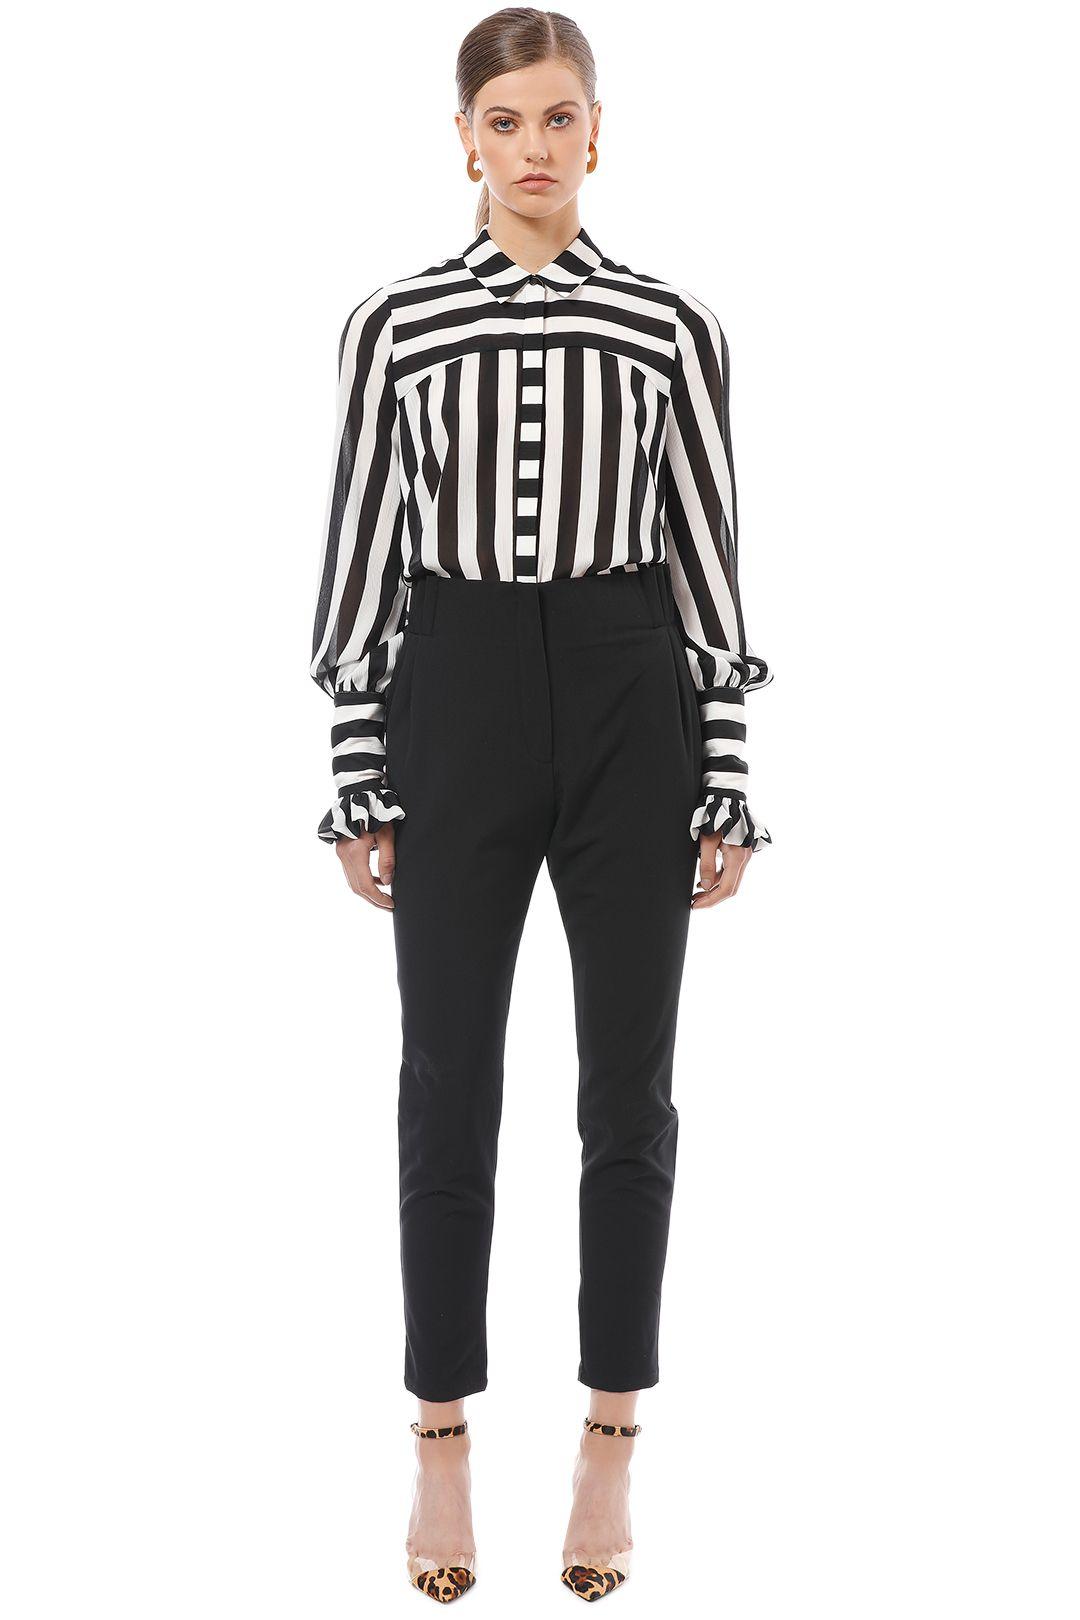 Cue - Bold Stripe Crinkle Georgette Shirt - Black White - Front